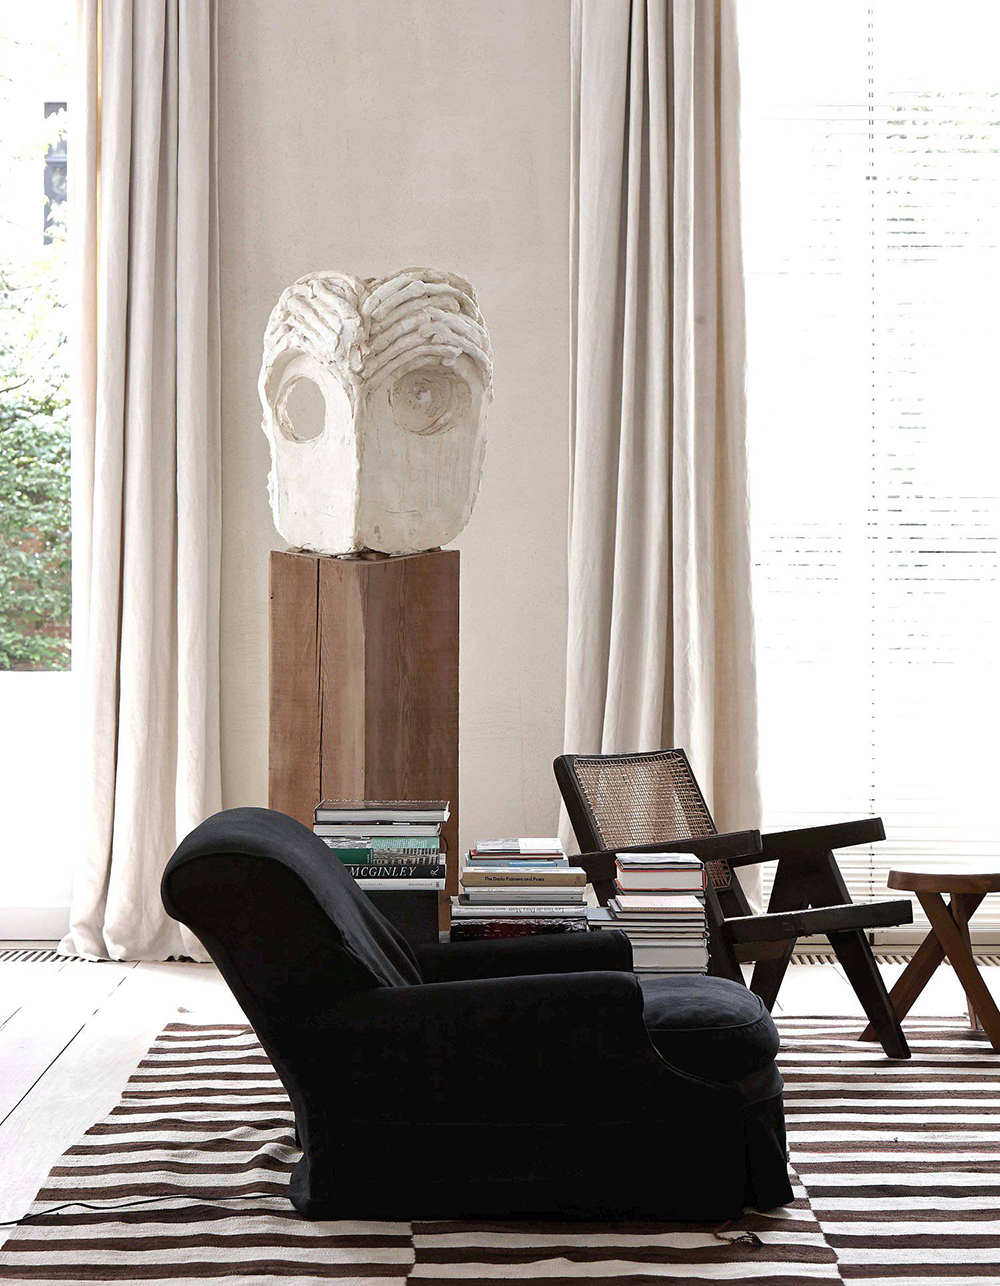 vvdii-residence-antwerp-belgium-sunday-sanctuary-oraclefox01